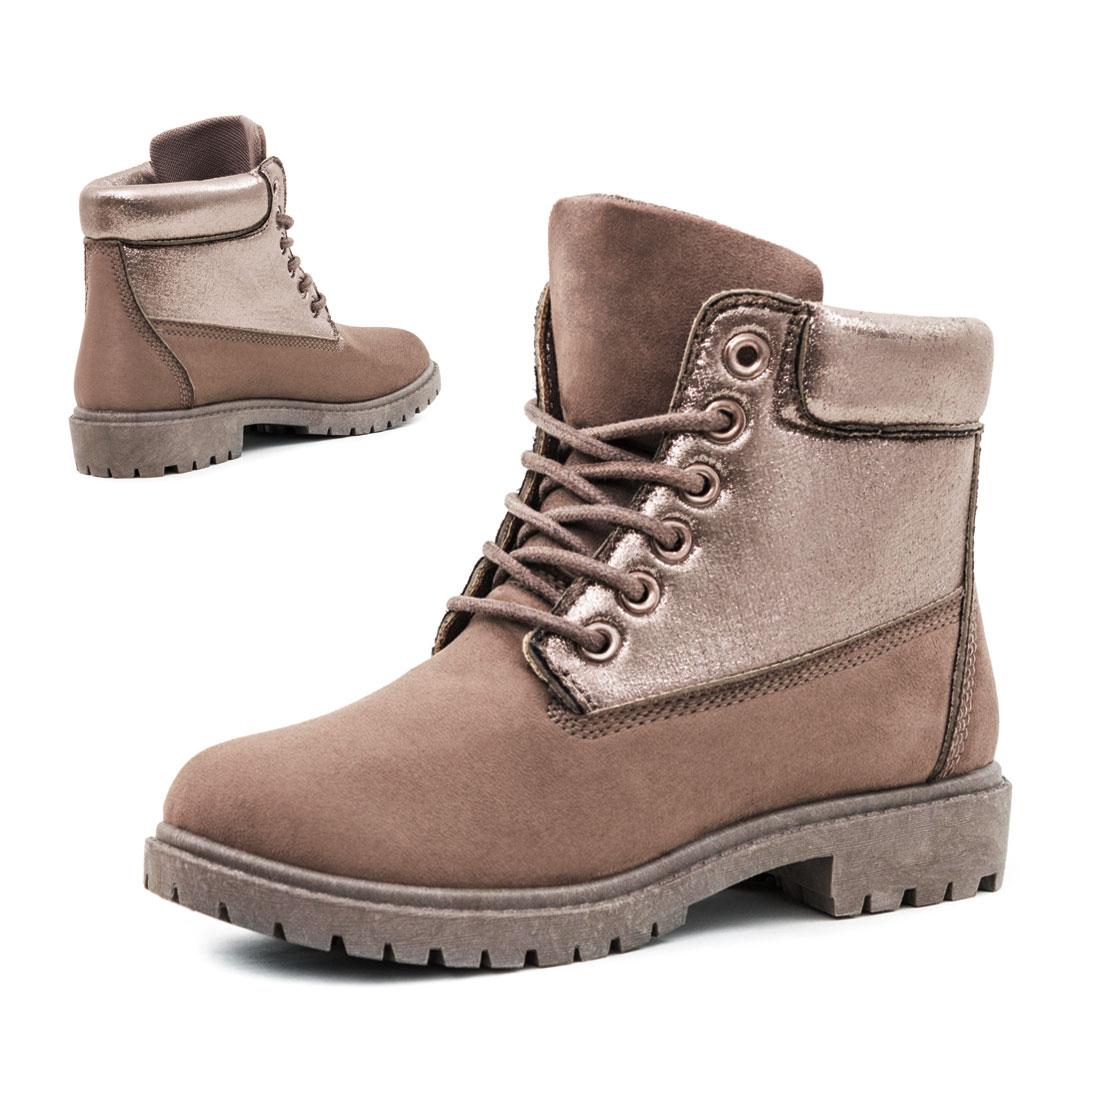 damen herbst winter boots schn rer metallic stiefeletten. Black Bedroom Furniture Sets. Home Design Ideas